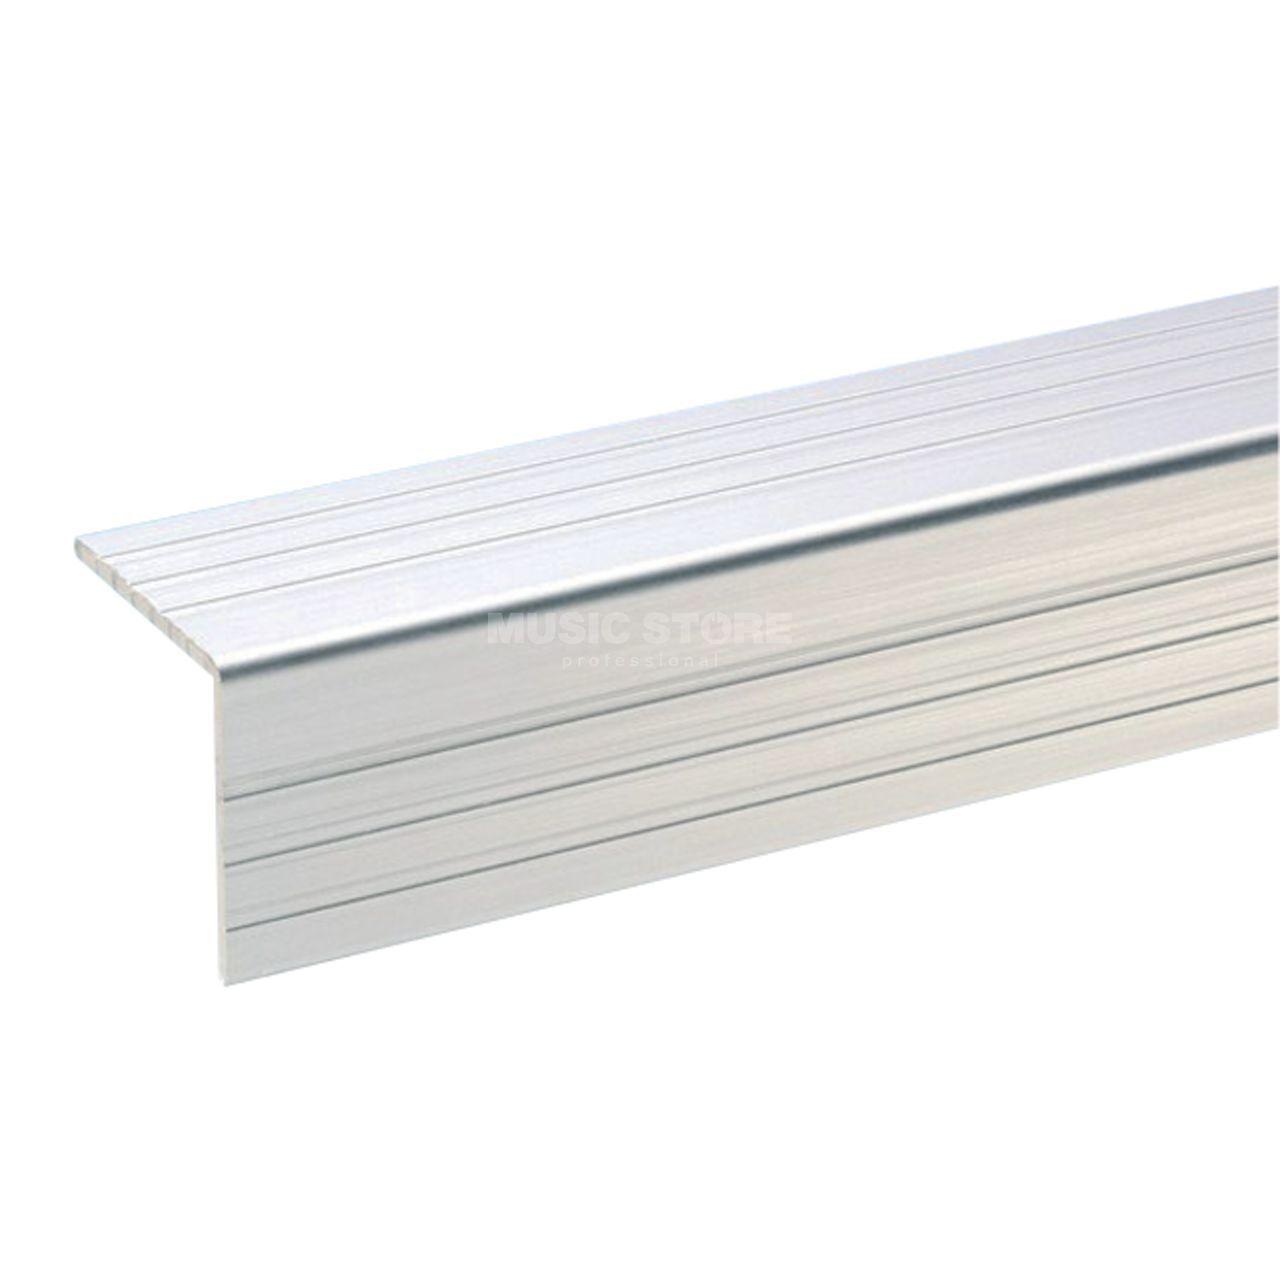 adam hall 6111 aluminium case angle 35 x 35 mm. Black Bedroom Furniture Sets. Home Design Ideas